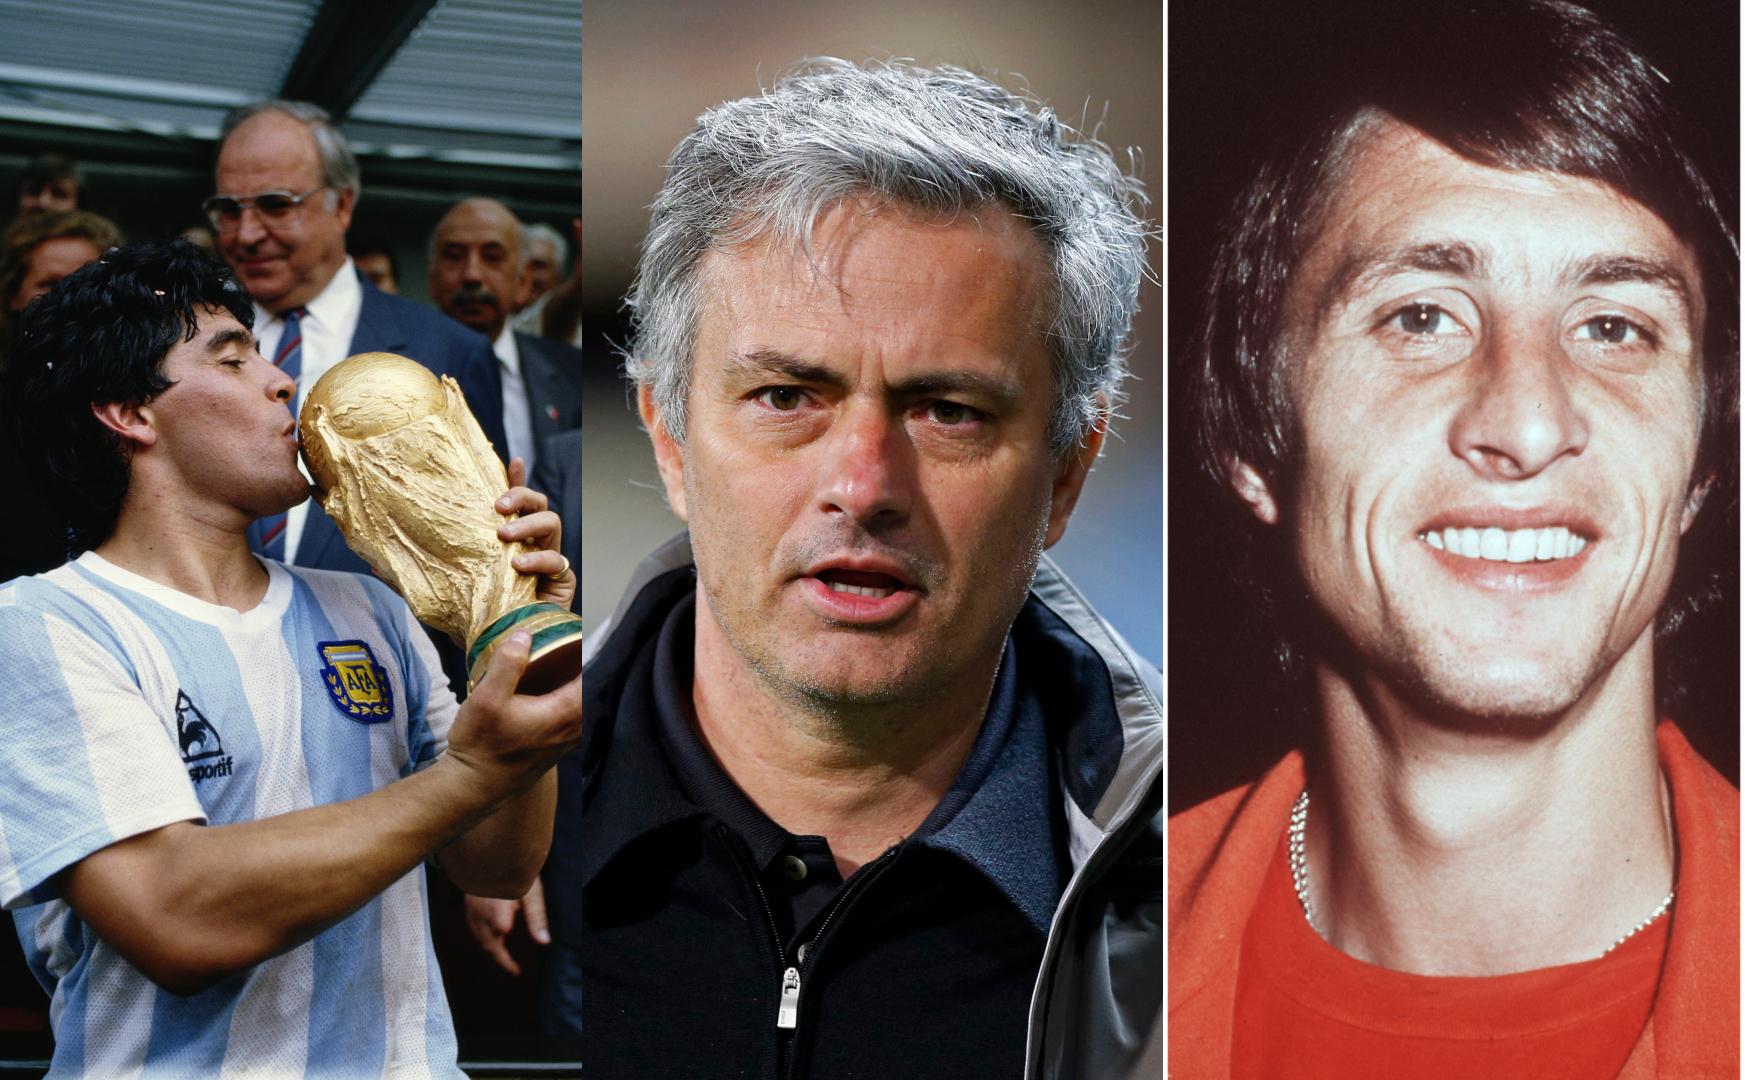 Maradona, Johan Cruyff and Jose Mourinho are Alejandro Menendez's all-time favourites